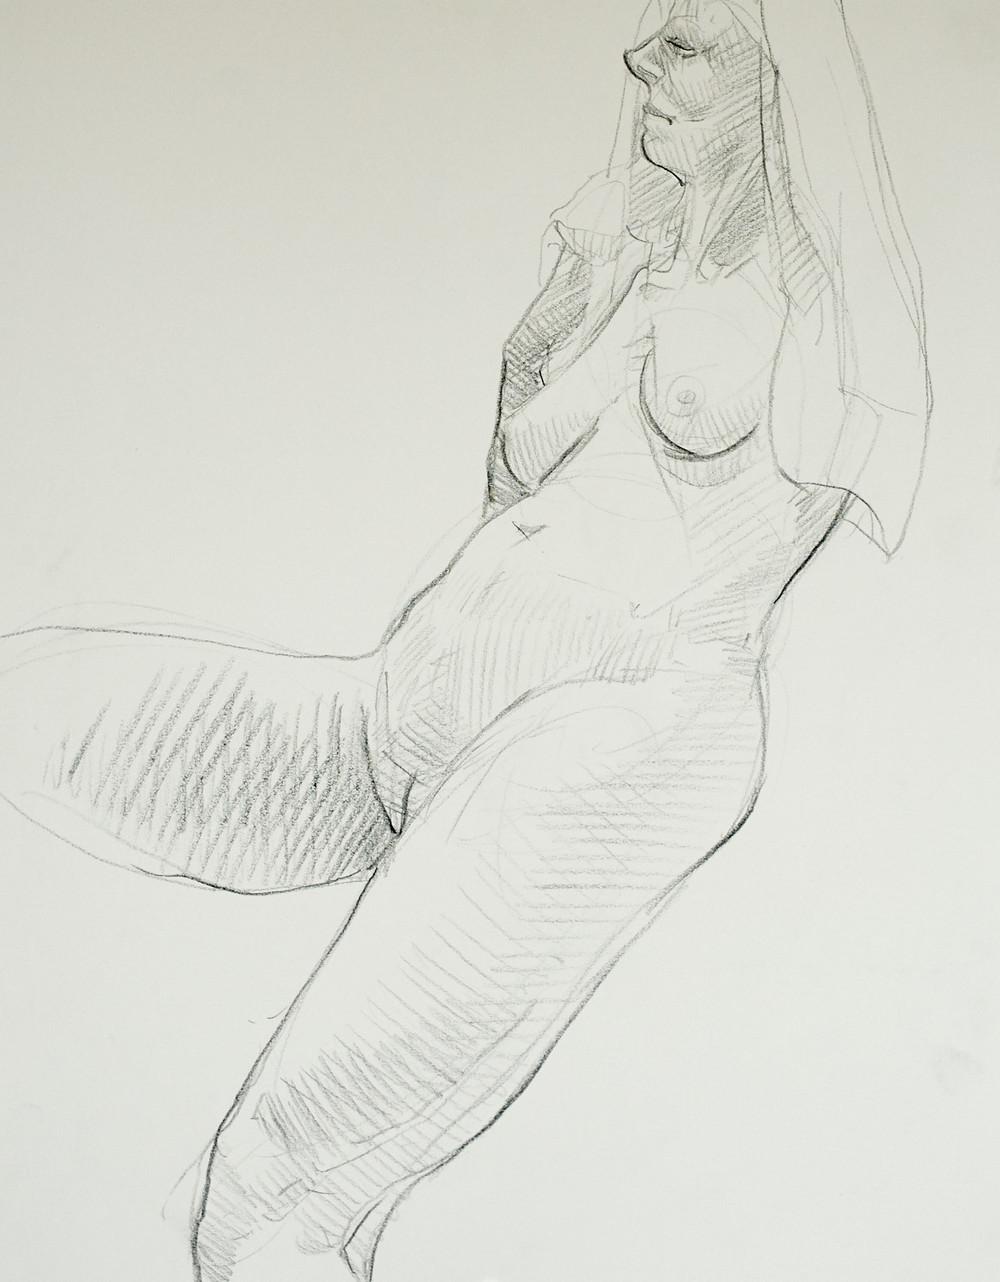 16Carolin_Figure_Drawing_2.jpg